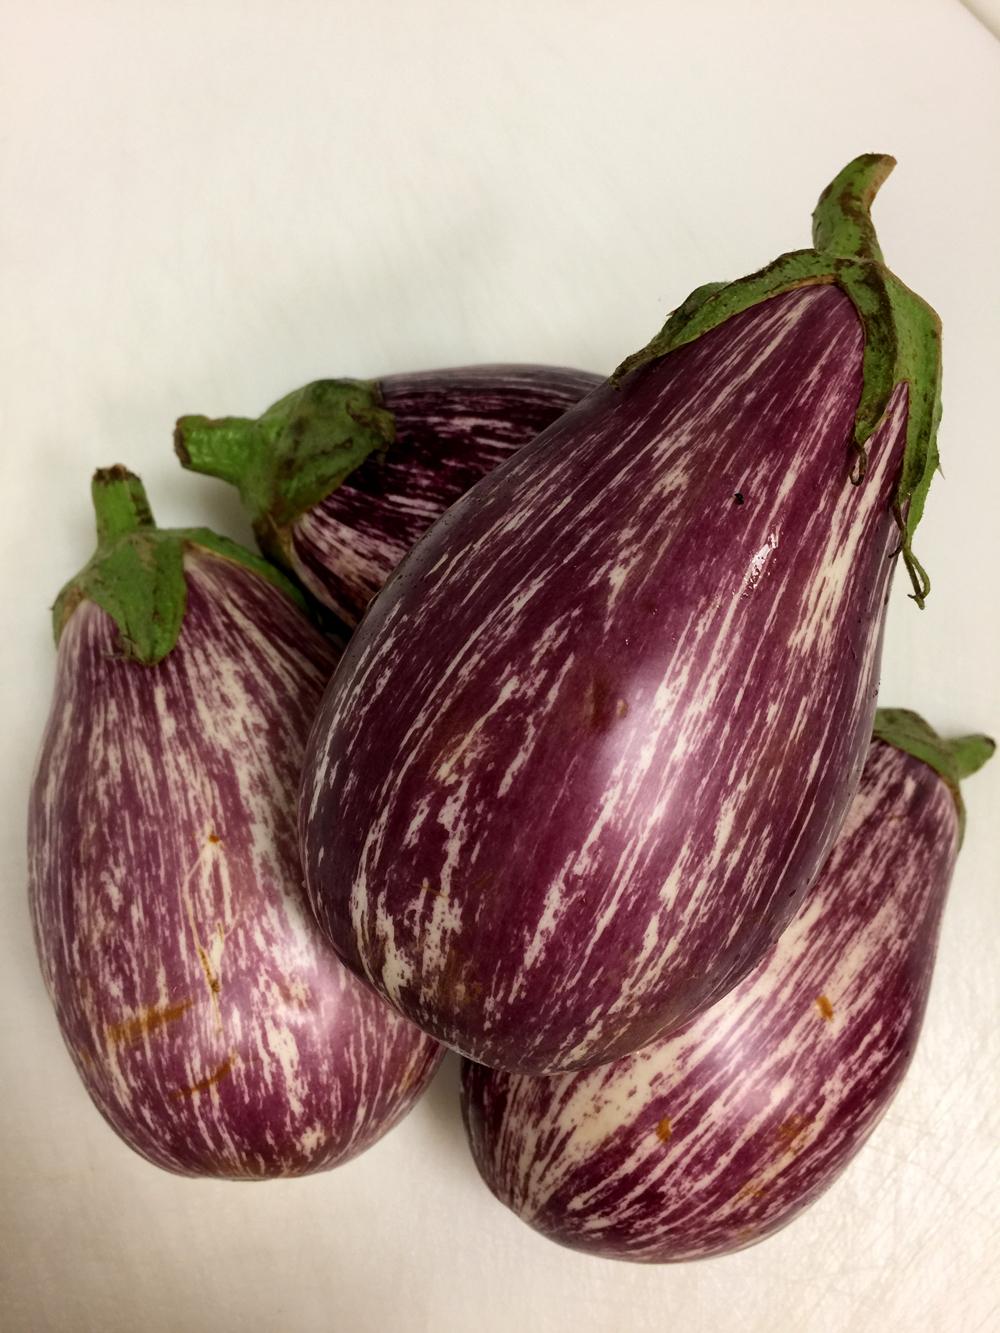 World Kitchen Private Chef Services Fresh Produce Eggplant